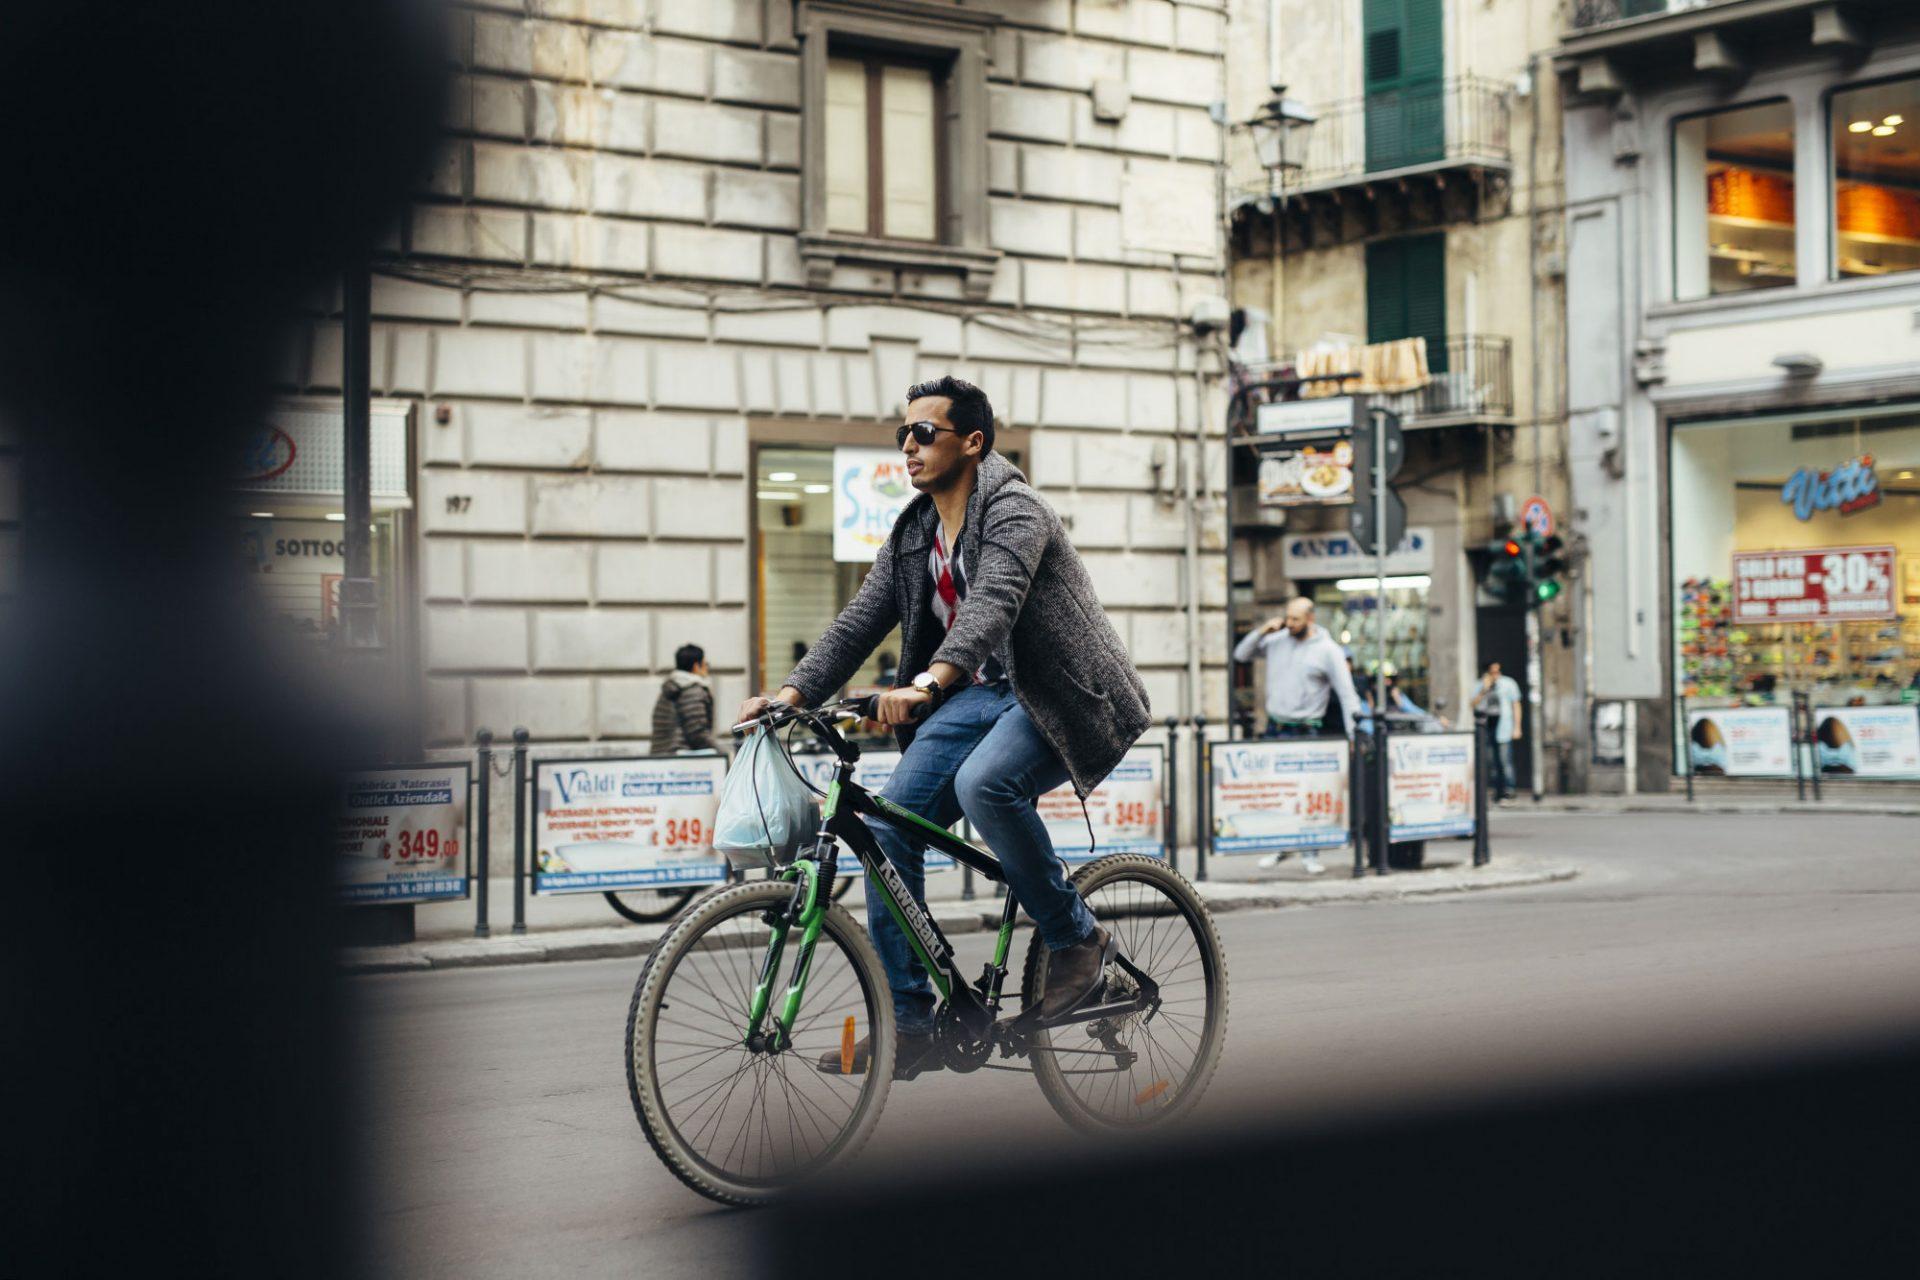 Palermo-Street-022